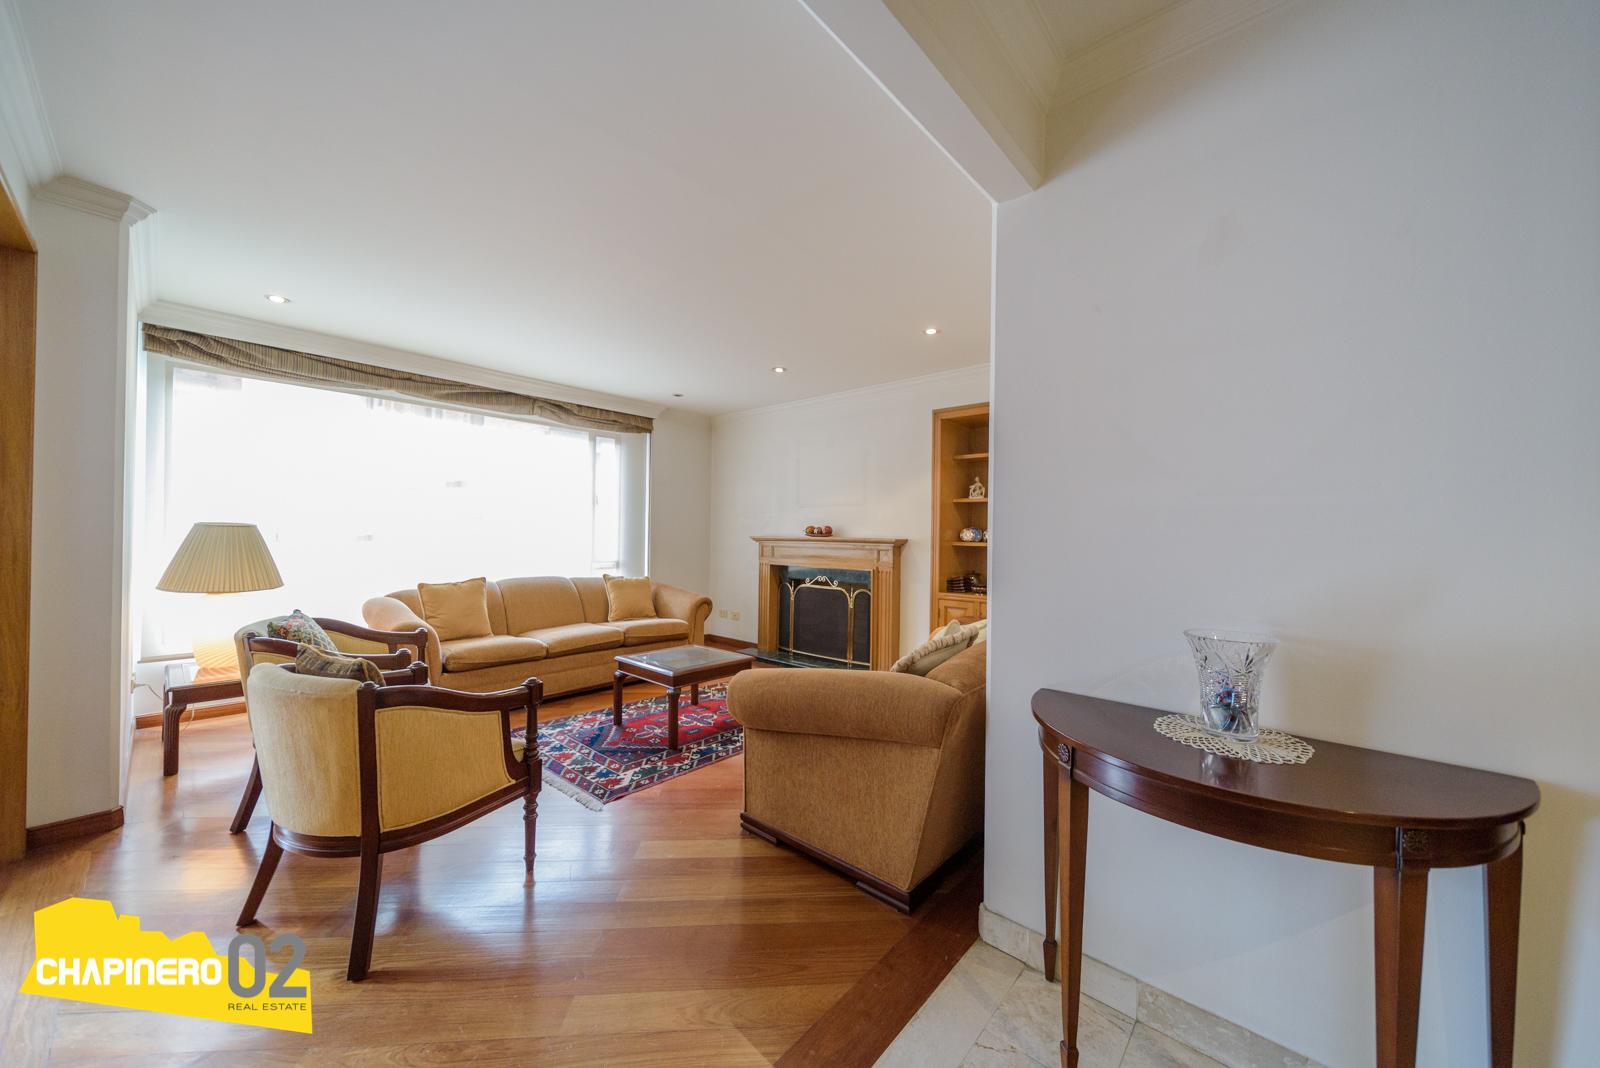 Apto Venta :: 162 m² :: Chicó Norte 3 :: $770 M